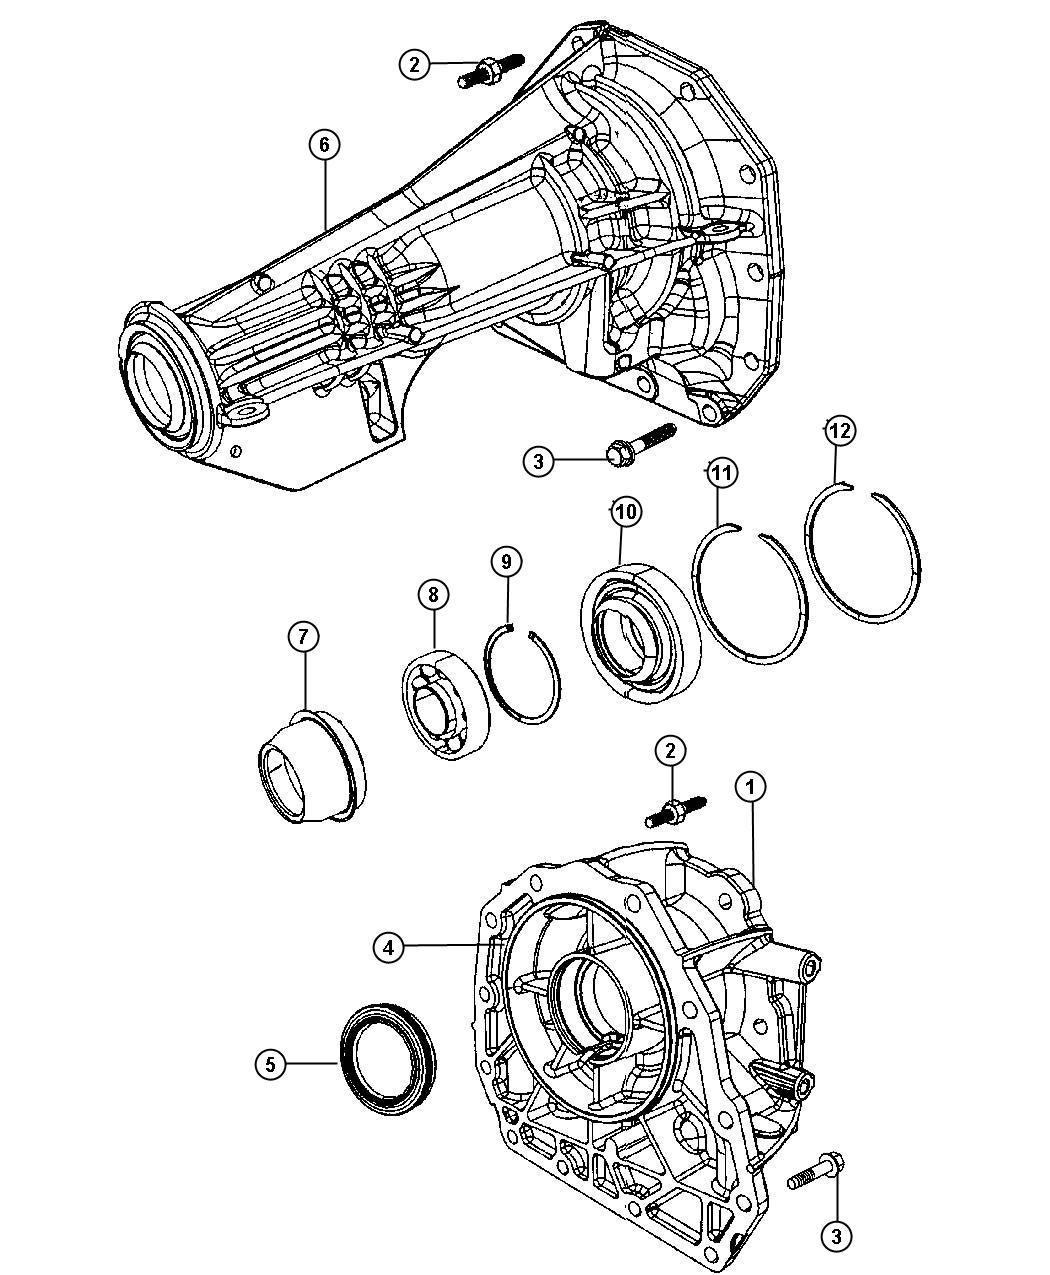 Dodge Neon Transmission Diagram